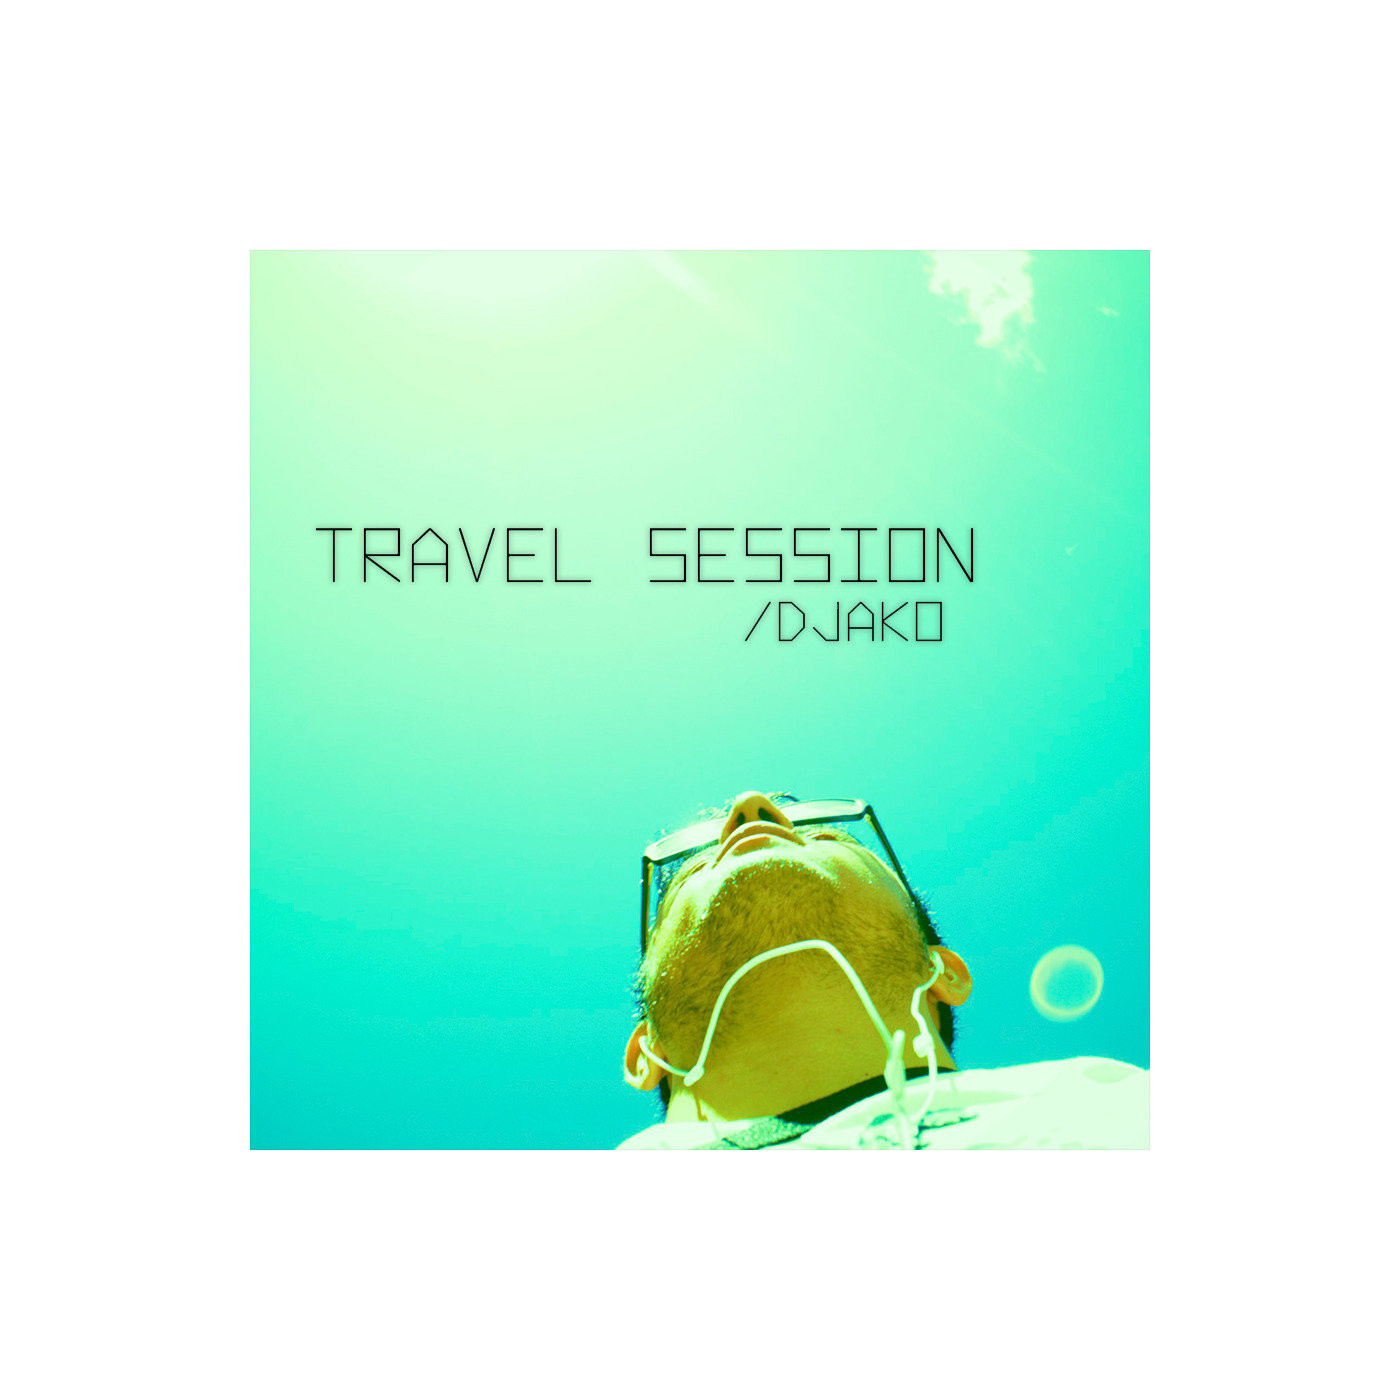 <![CDATA[Travel Session by Djako]]>